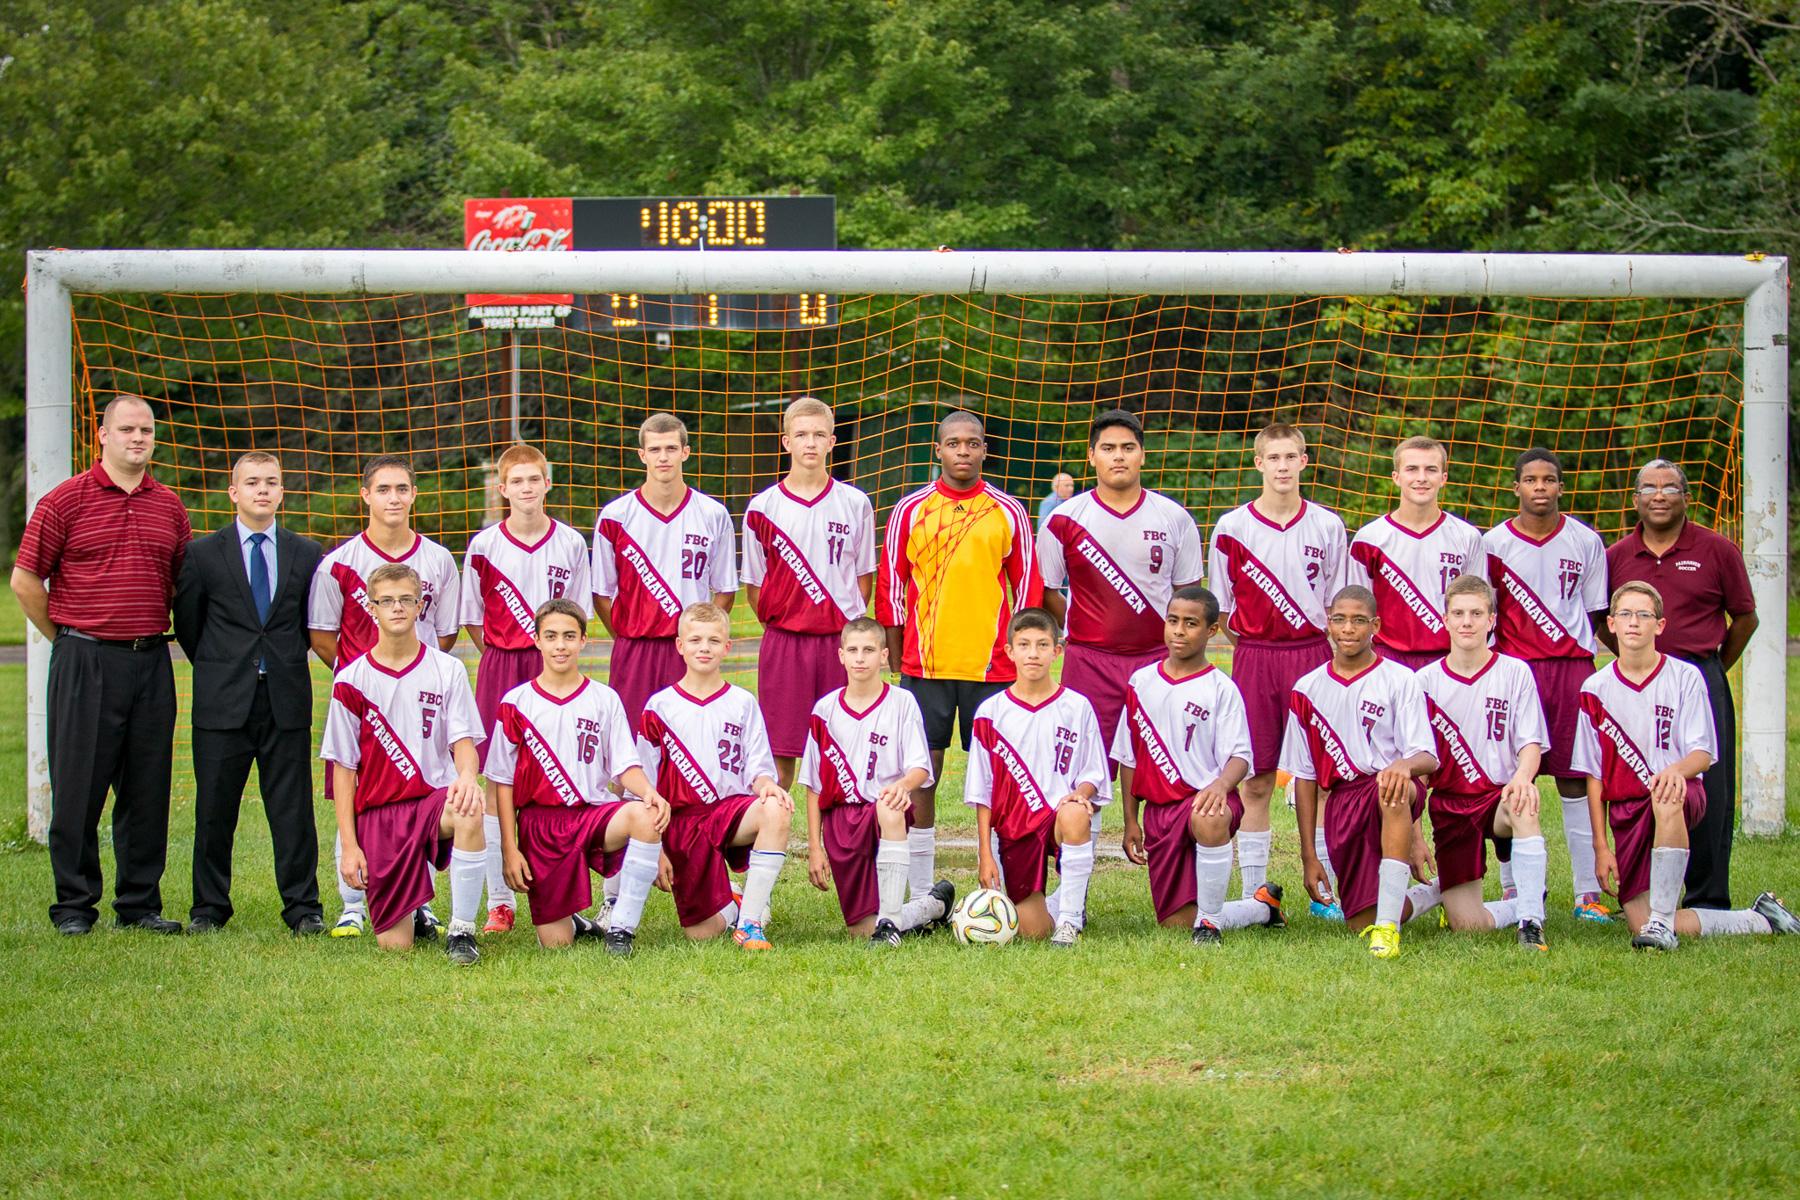 Fairhaven Baptist Academy Soccer 2015 (9 of 9)